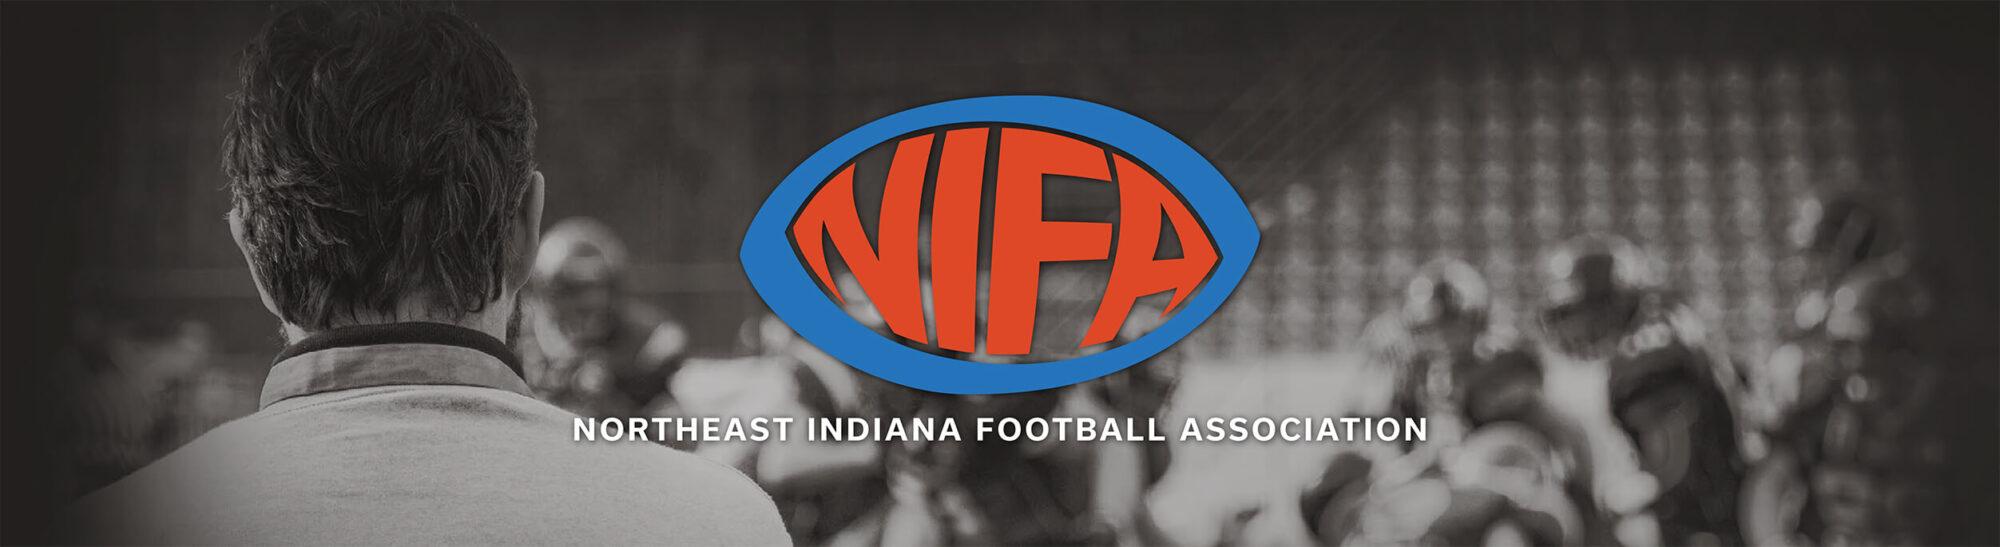 Northeast Indiana Football Association